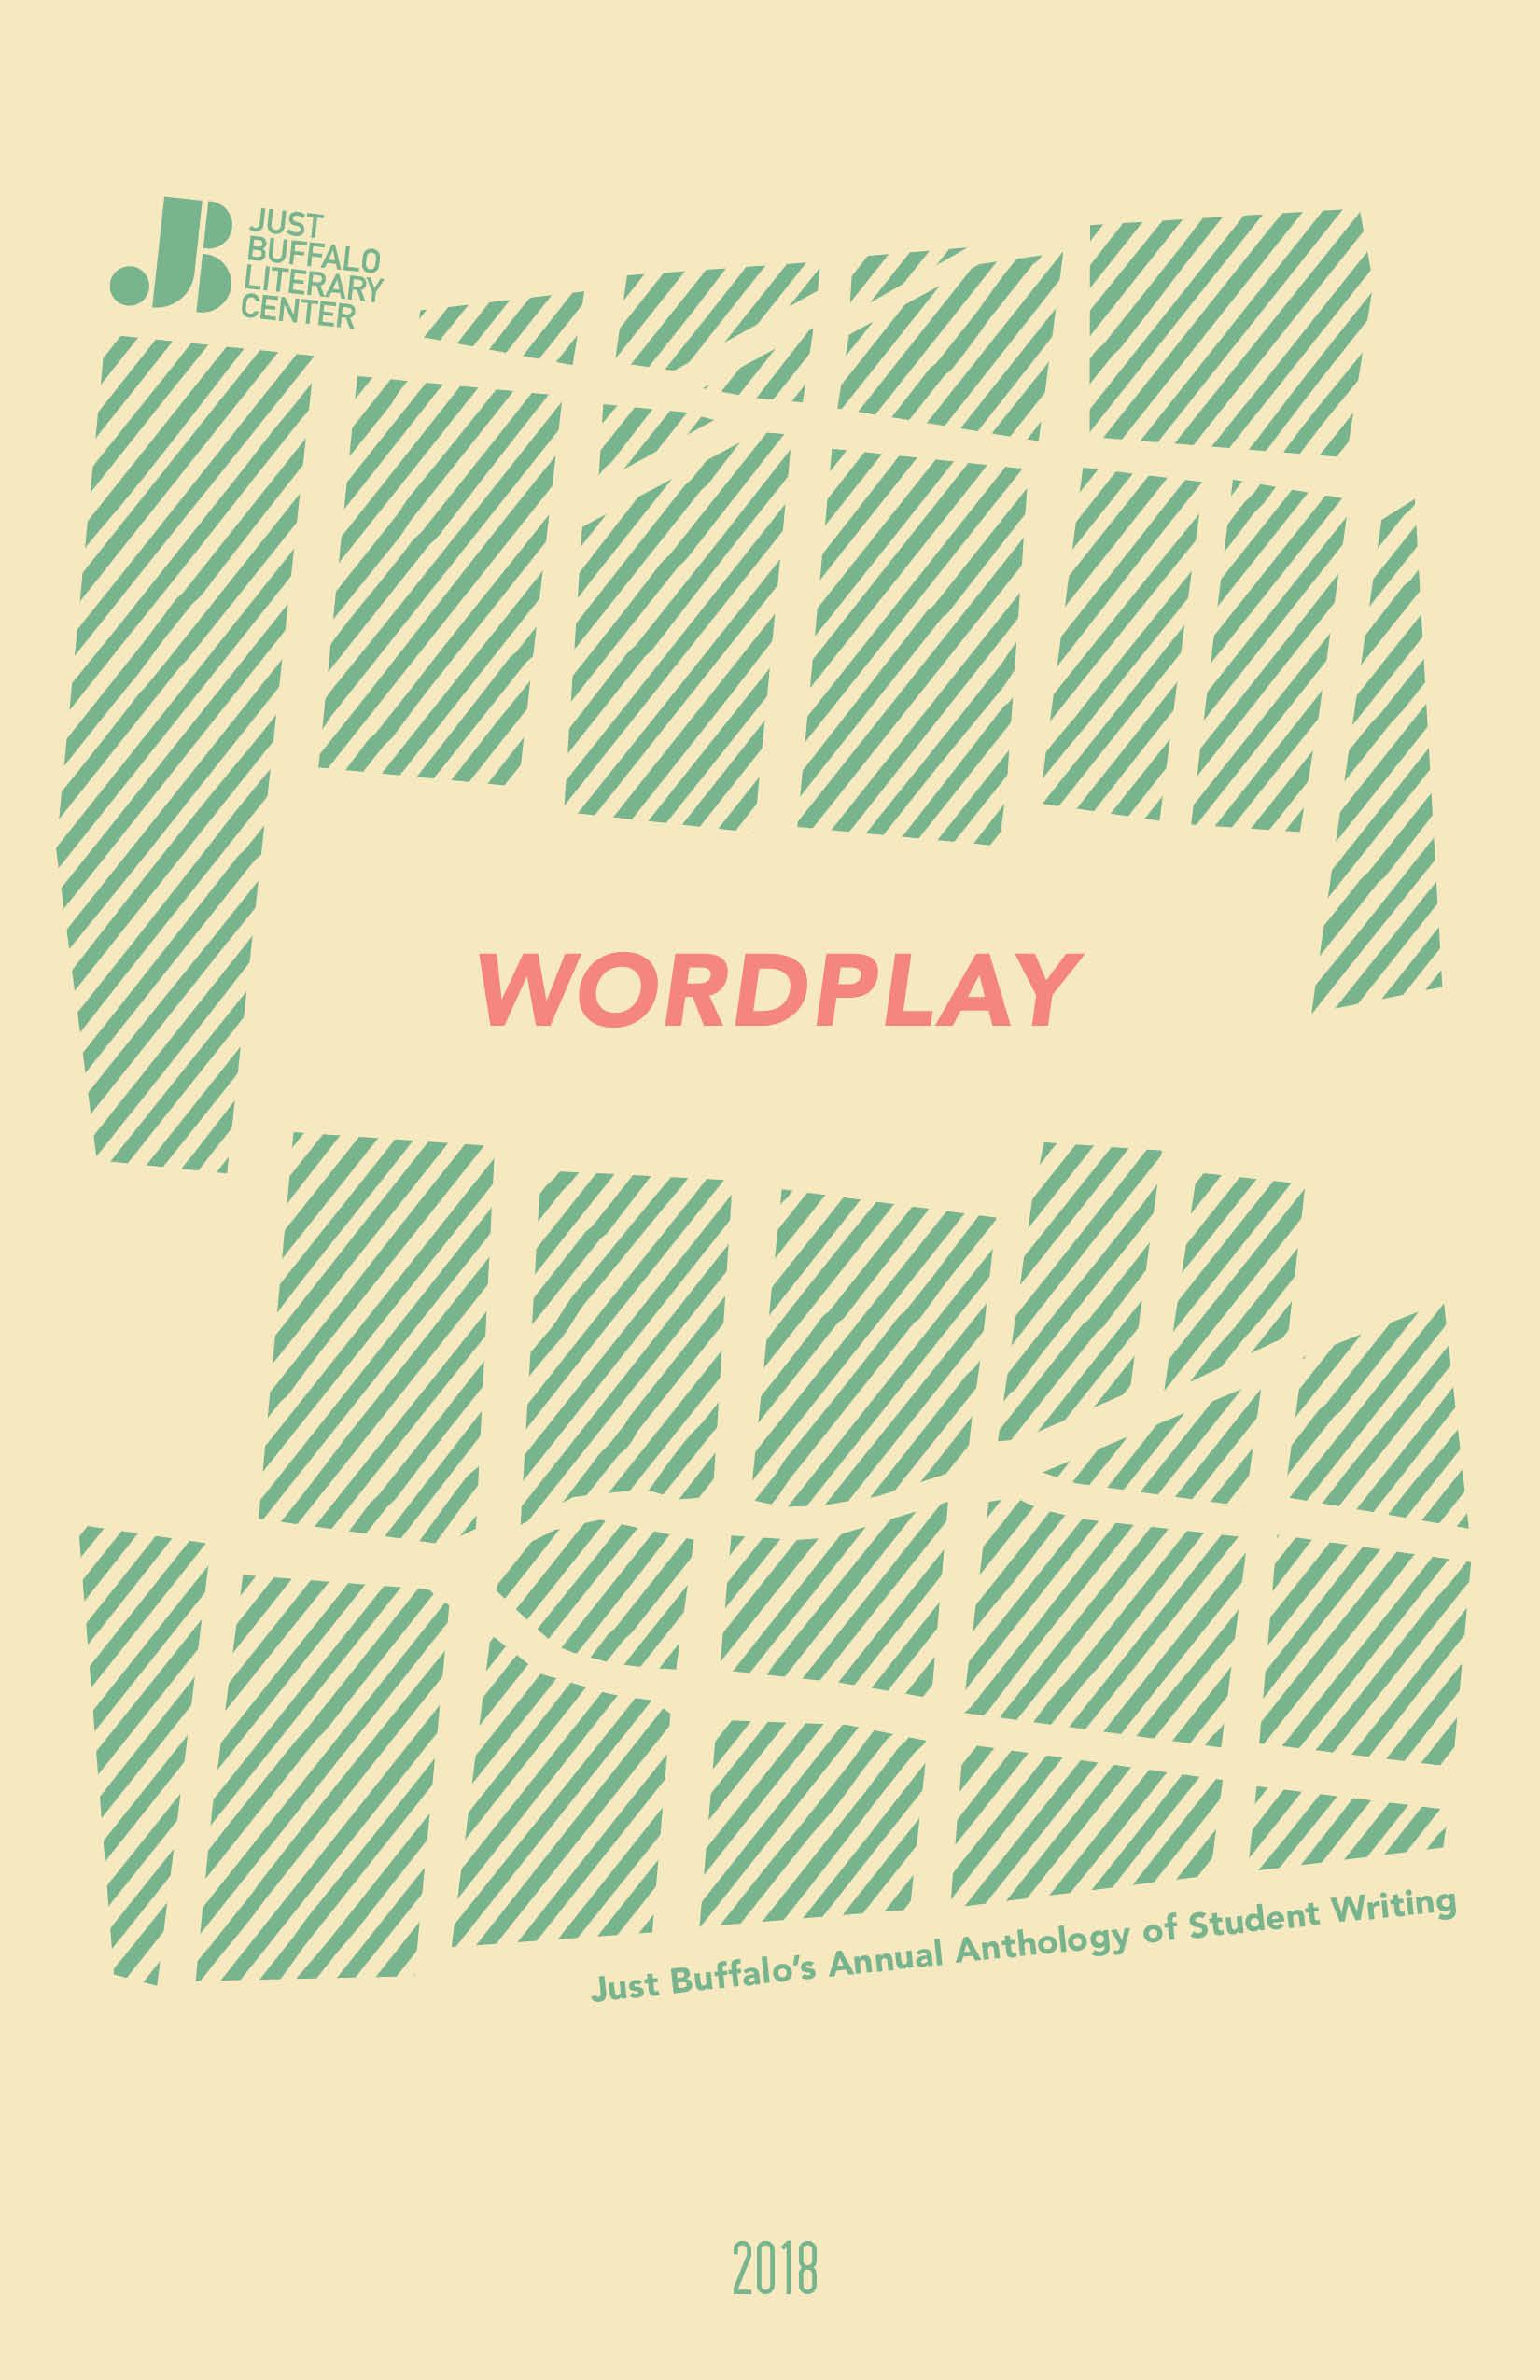 Wordplay 2018